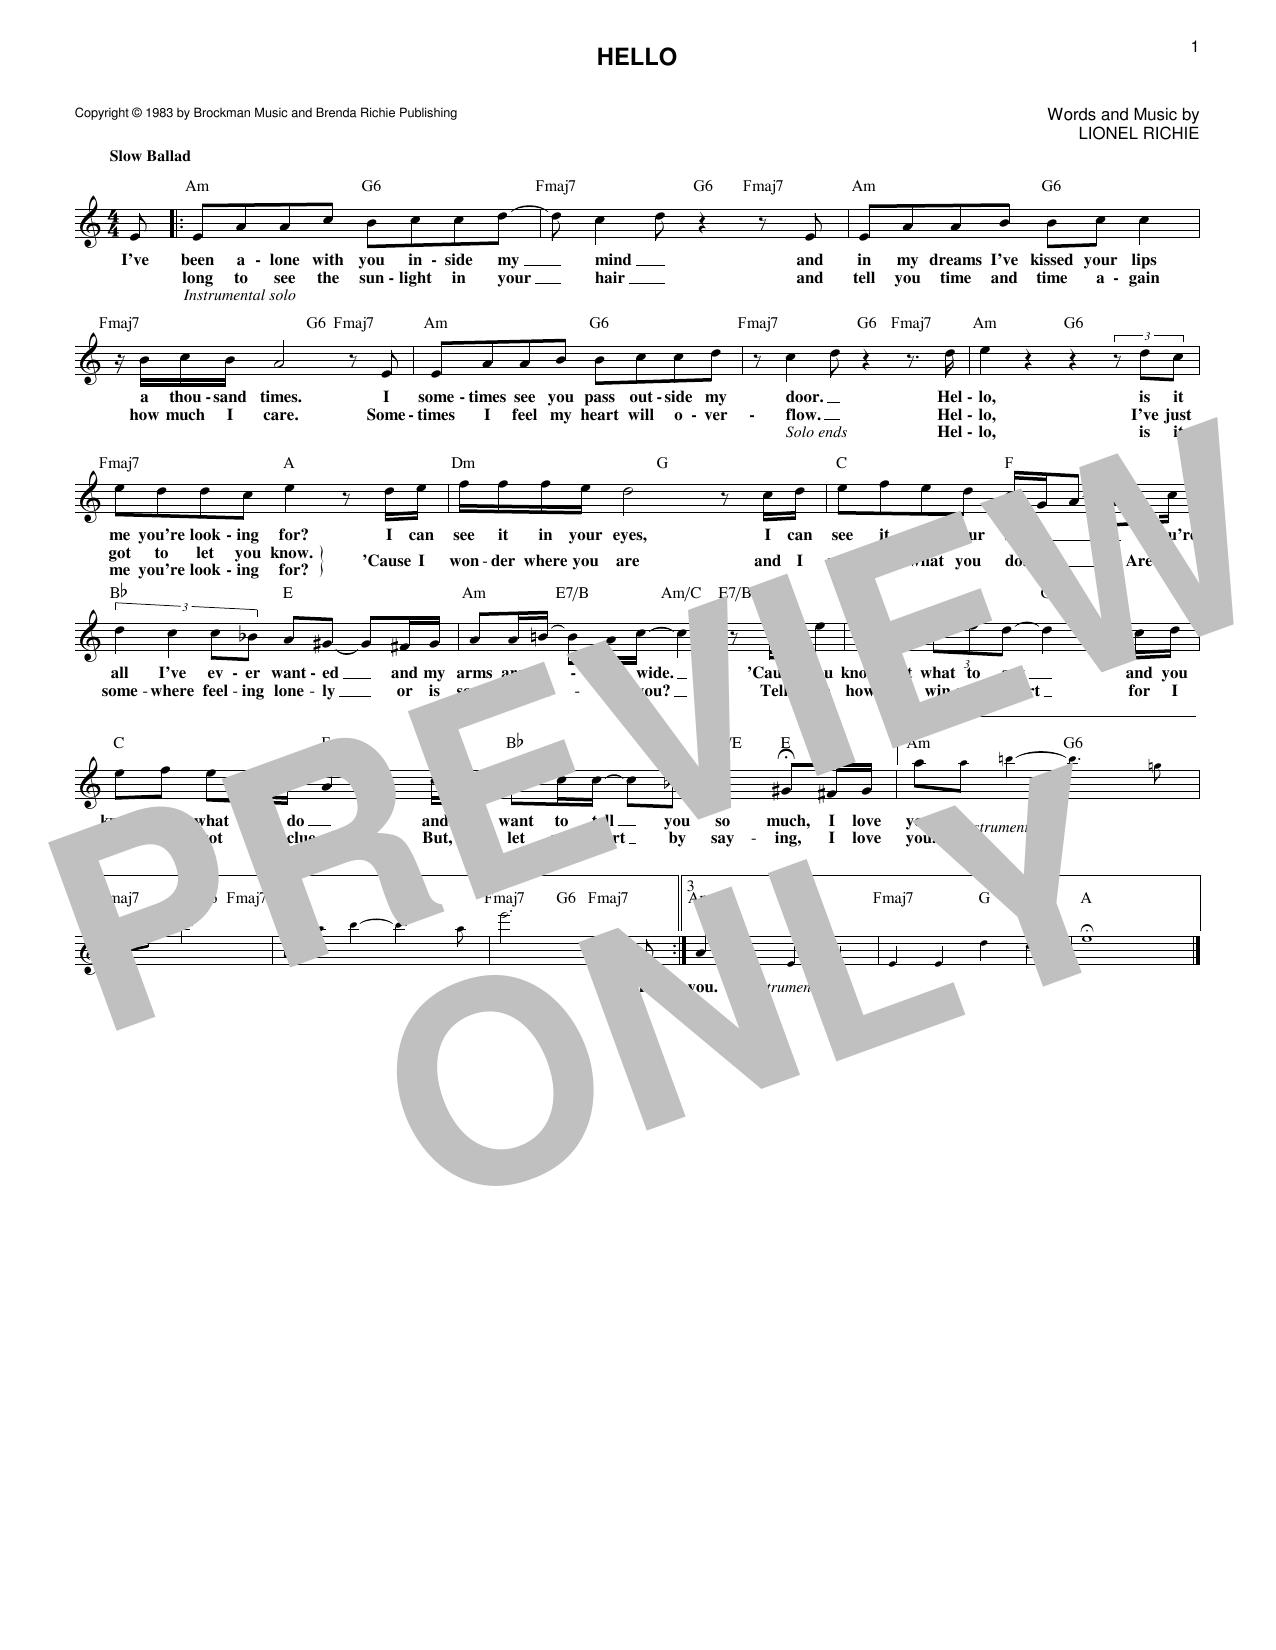 easy lionel richie sheet music pdf